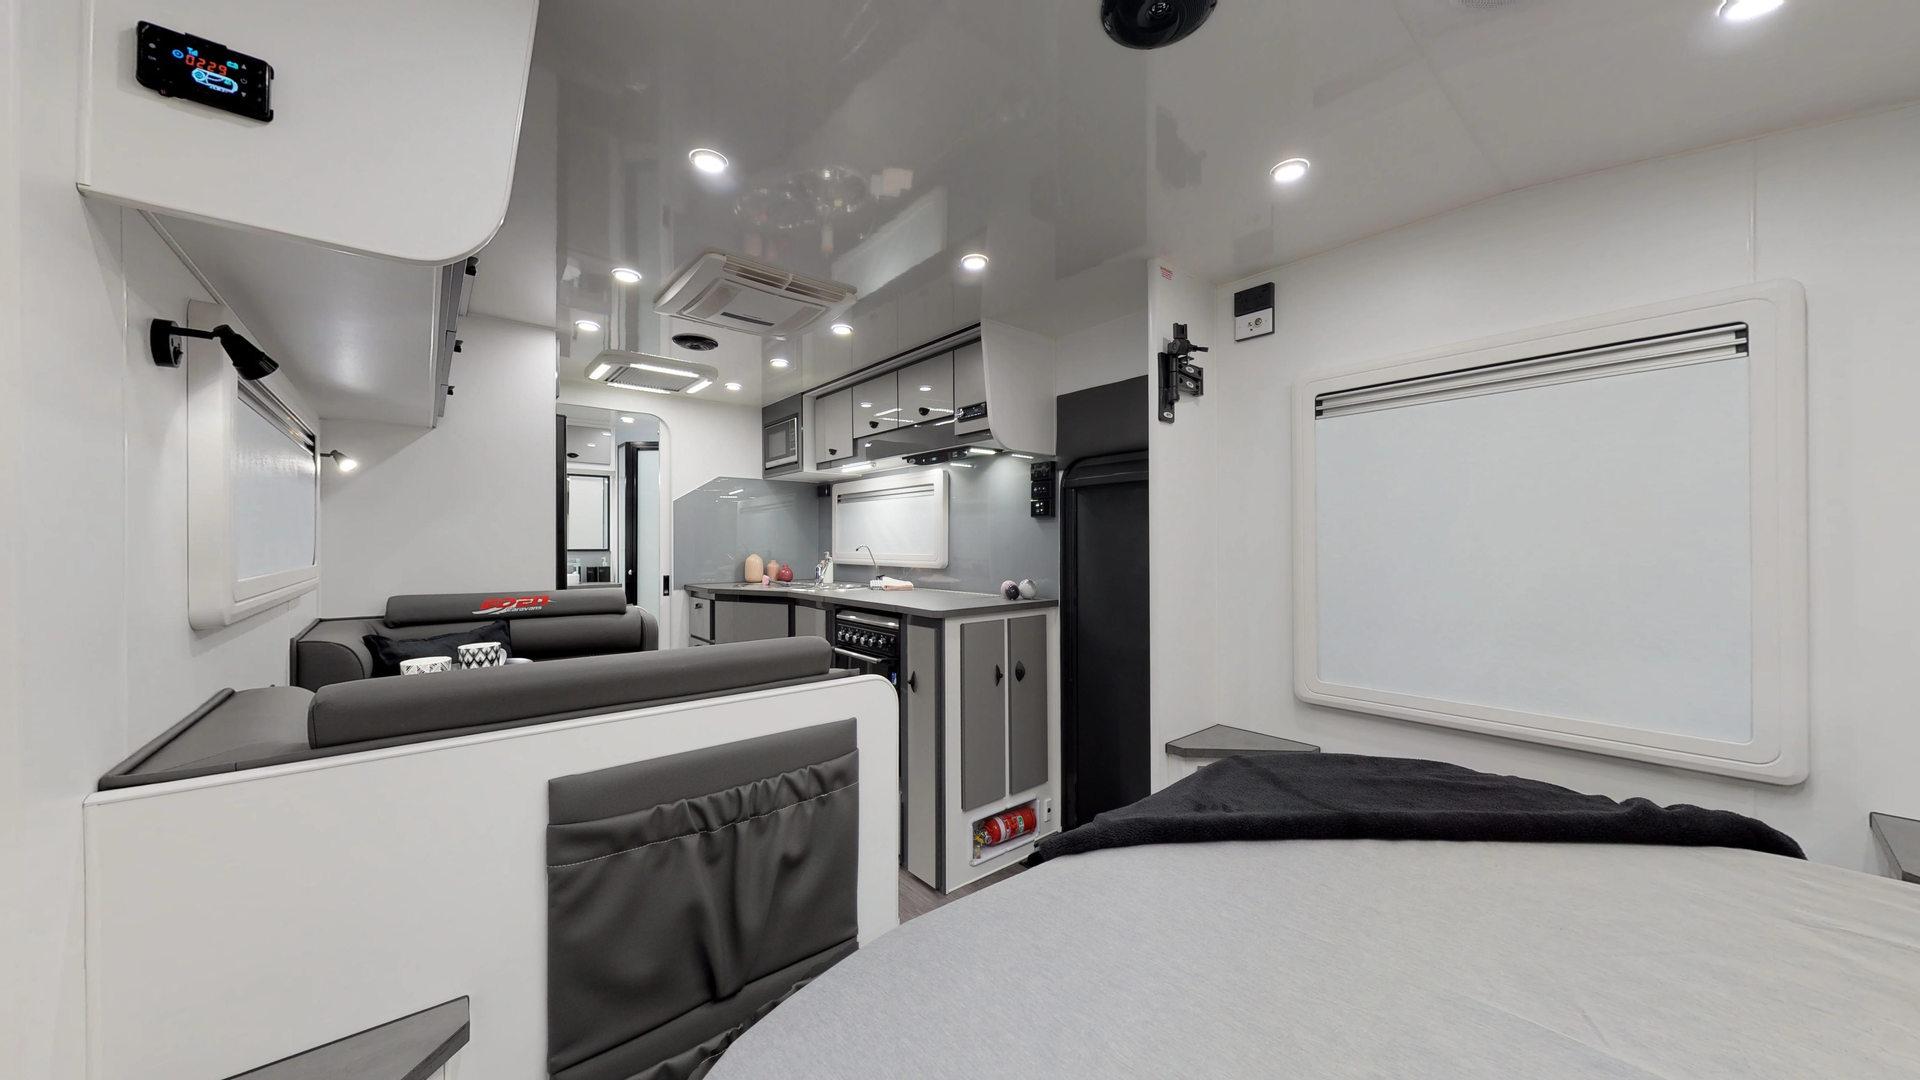 Trackvan Xt 22